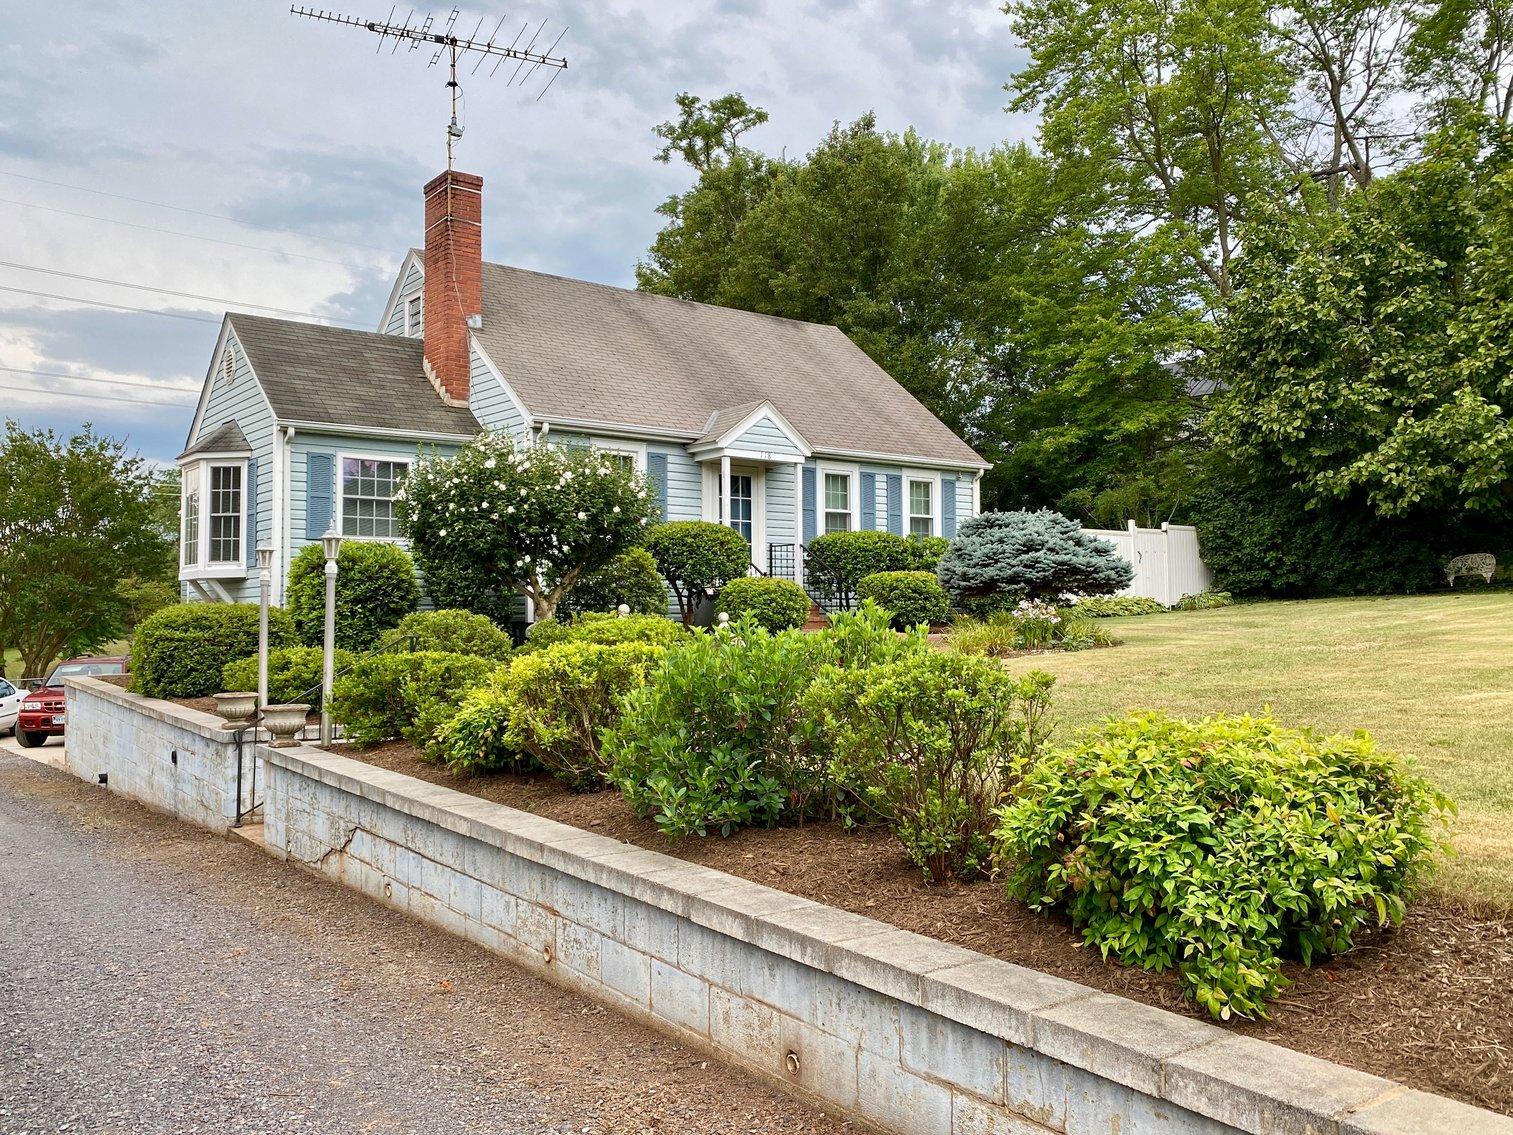 3 BR/2 BA Home w/Detached Shop/Garage on 1.8 +/- Acres in the Town of Orange, VA